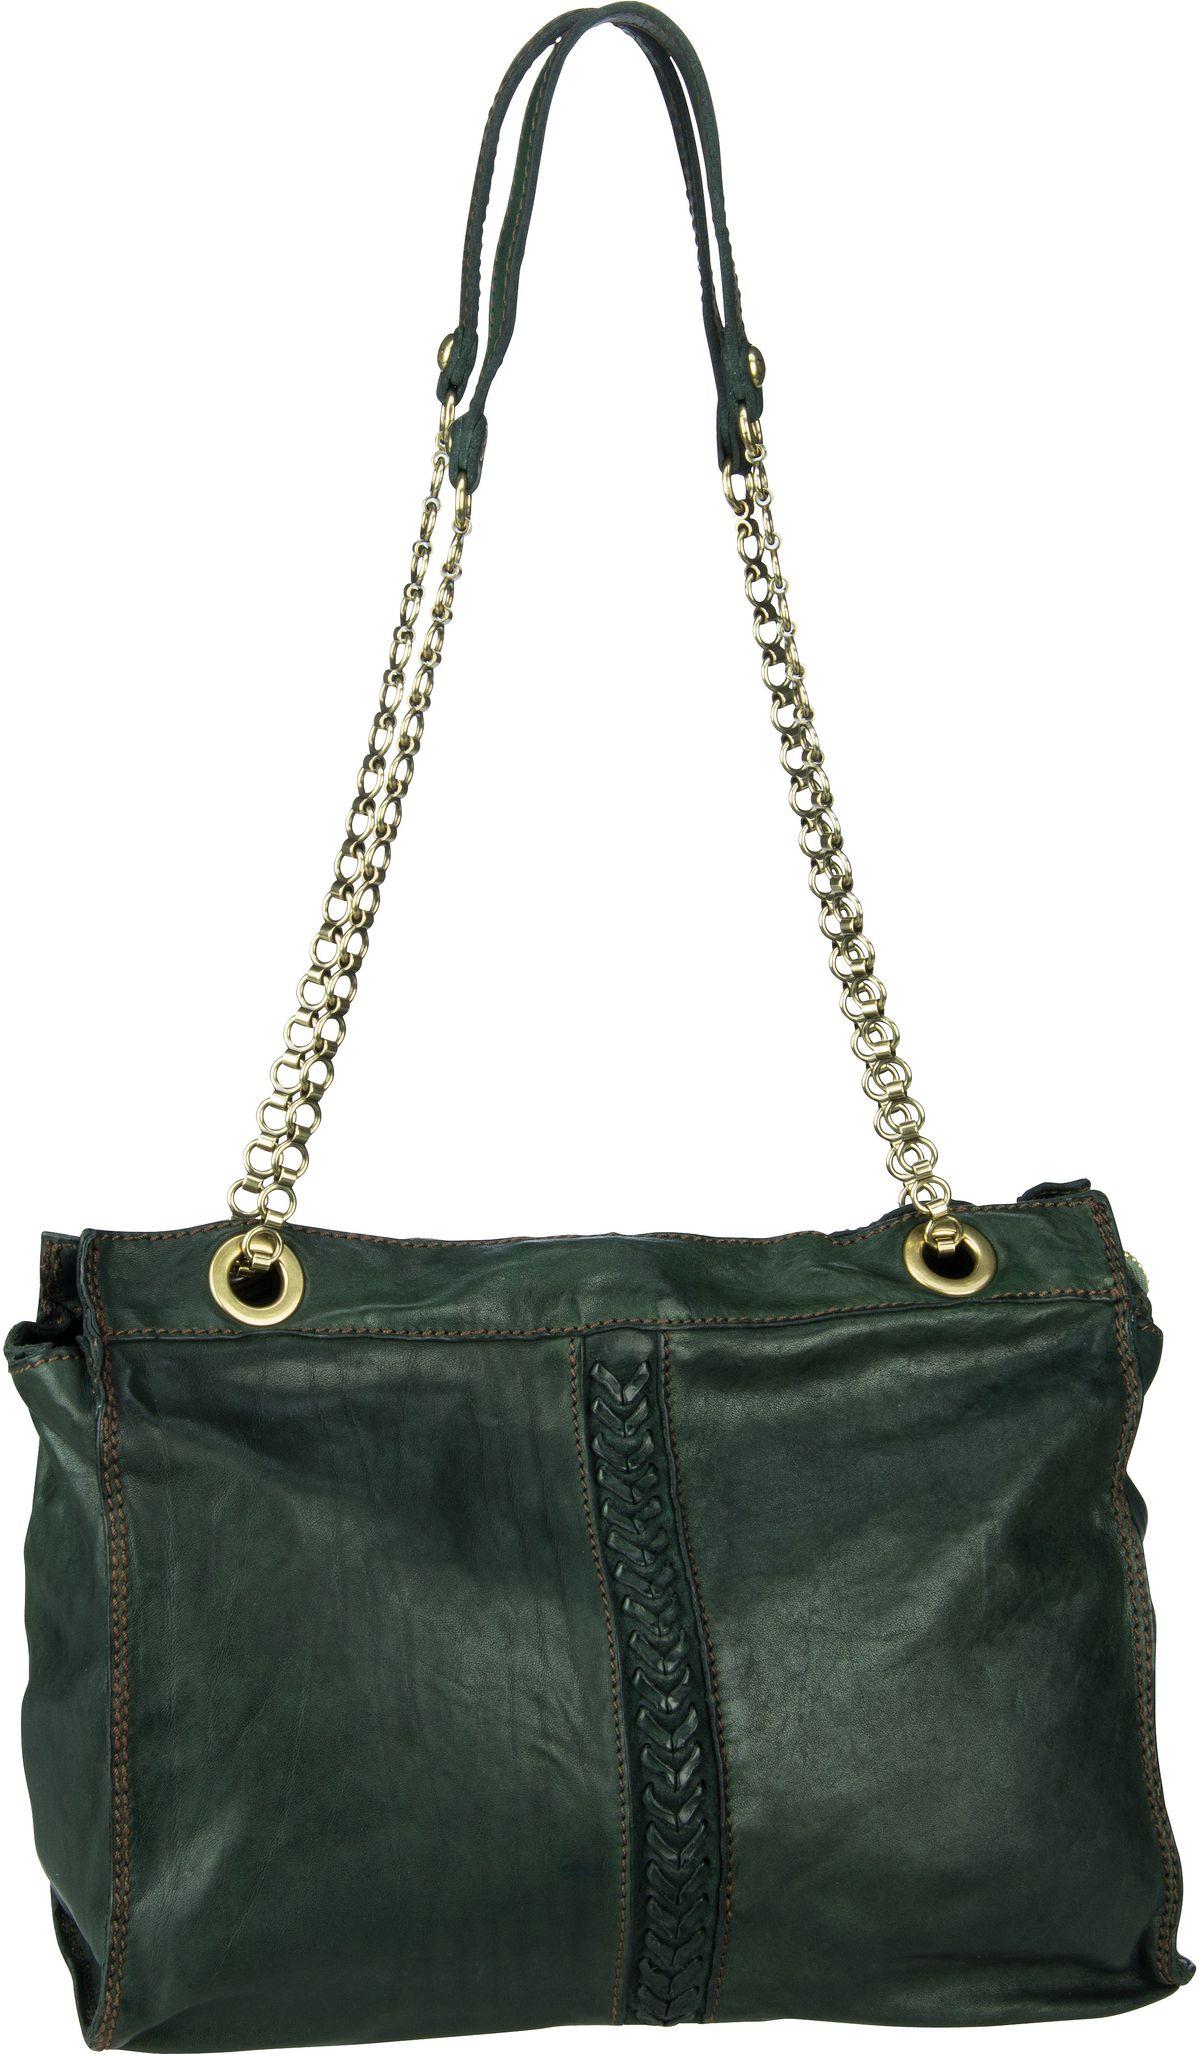 Handtasche Afrodite C16640 Verde Bottiglia